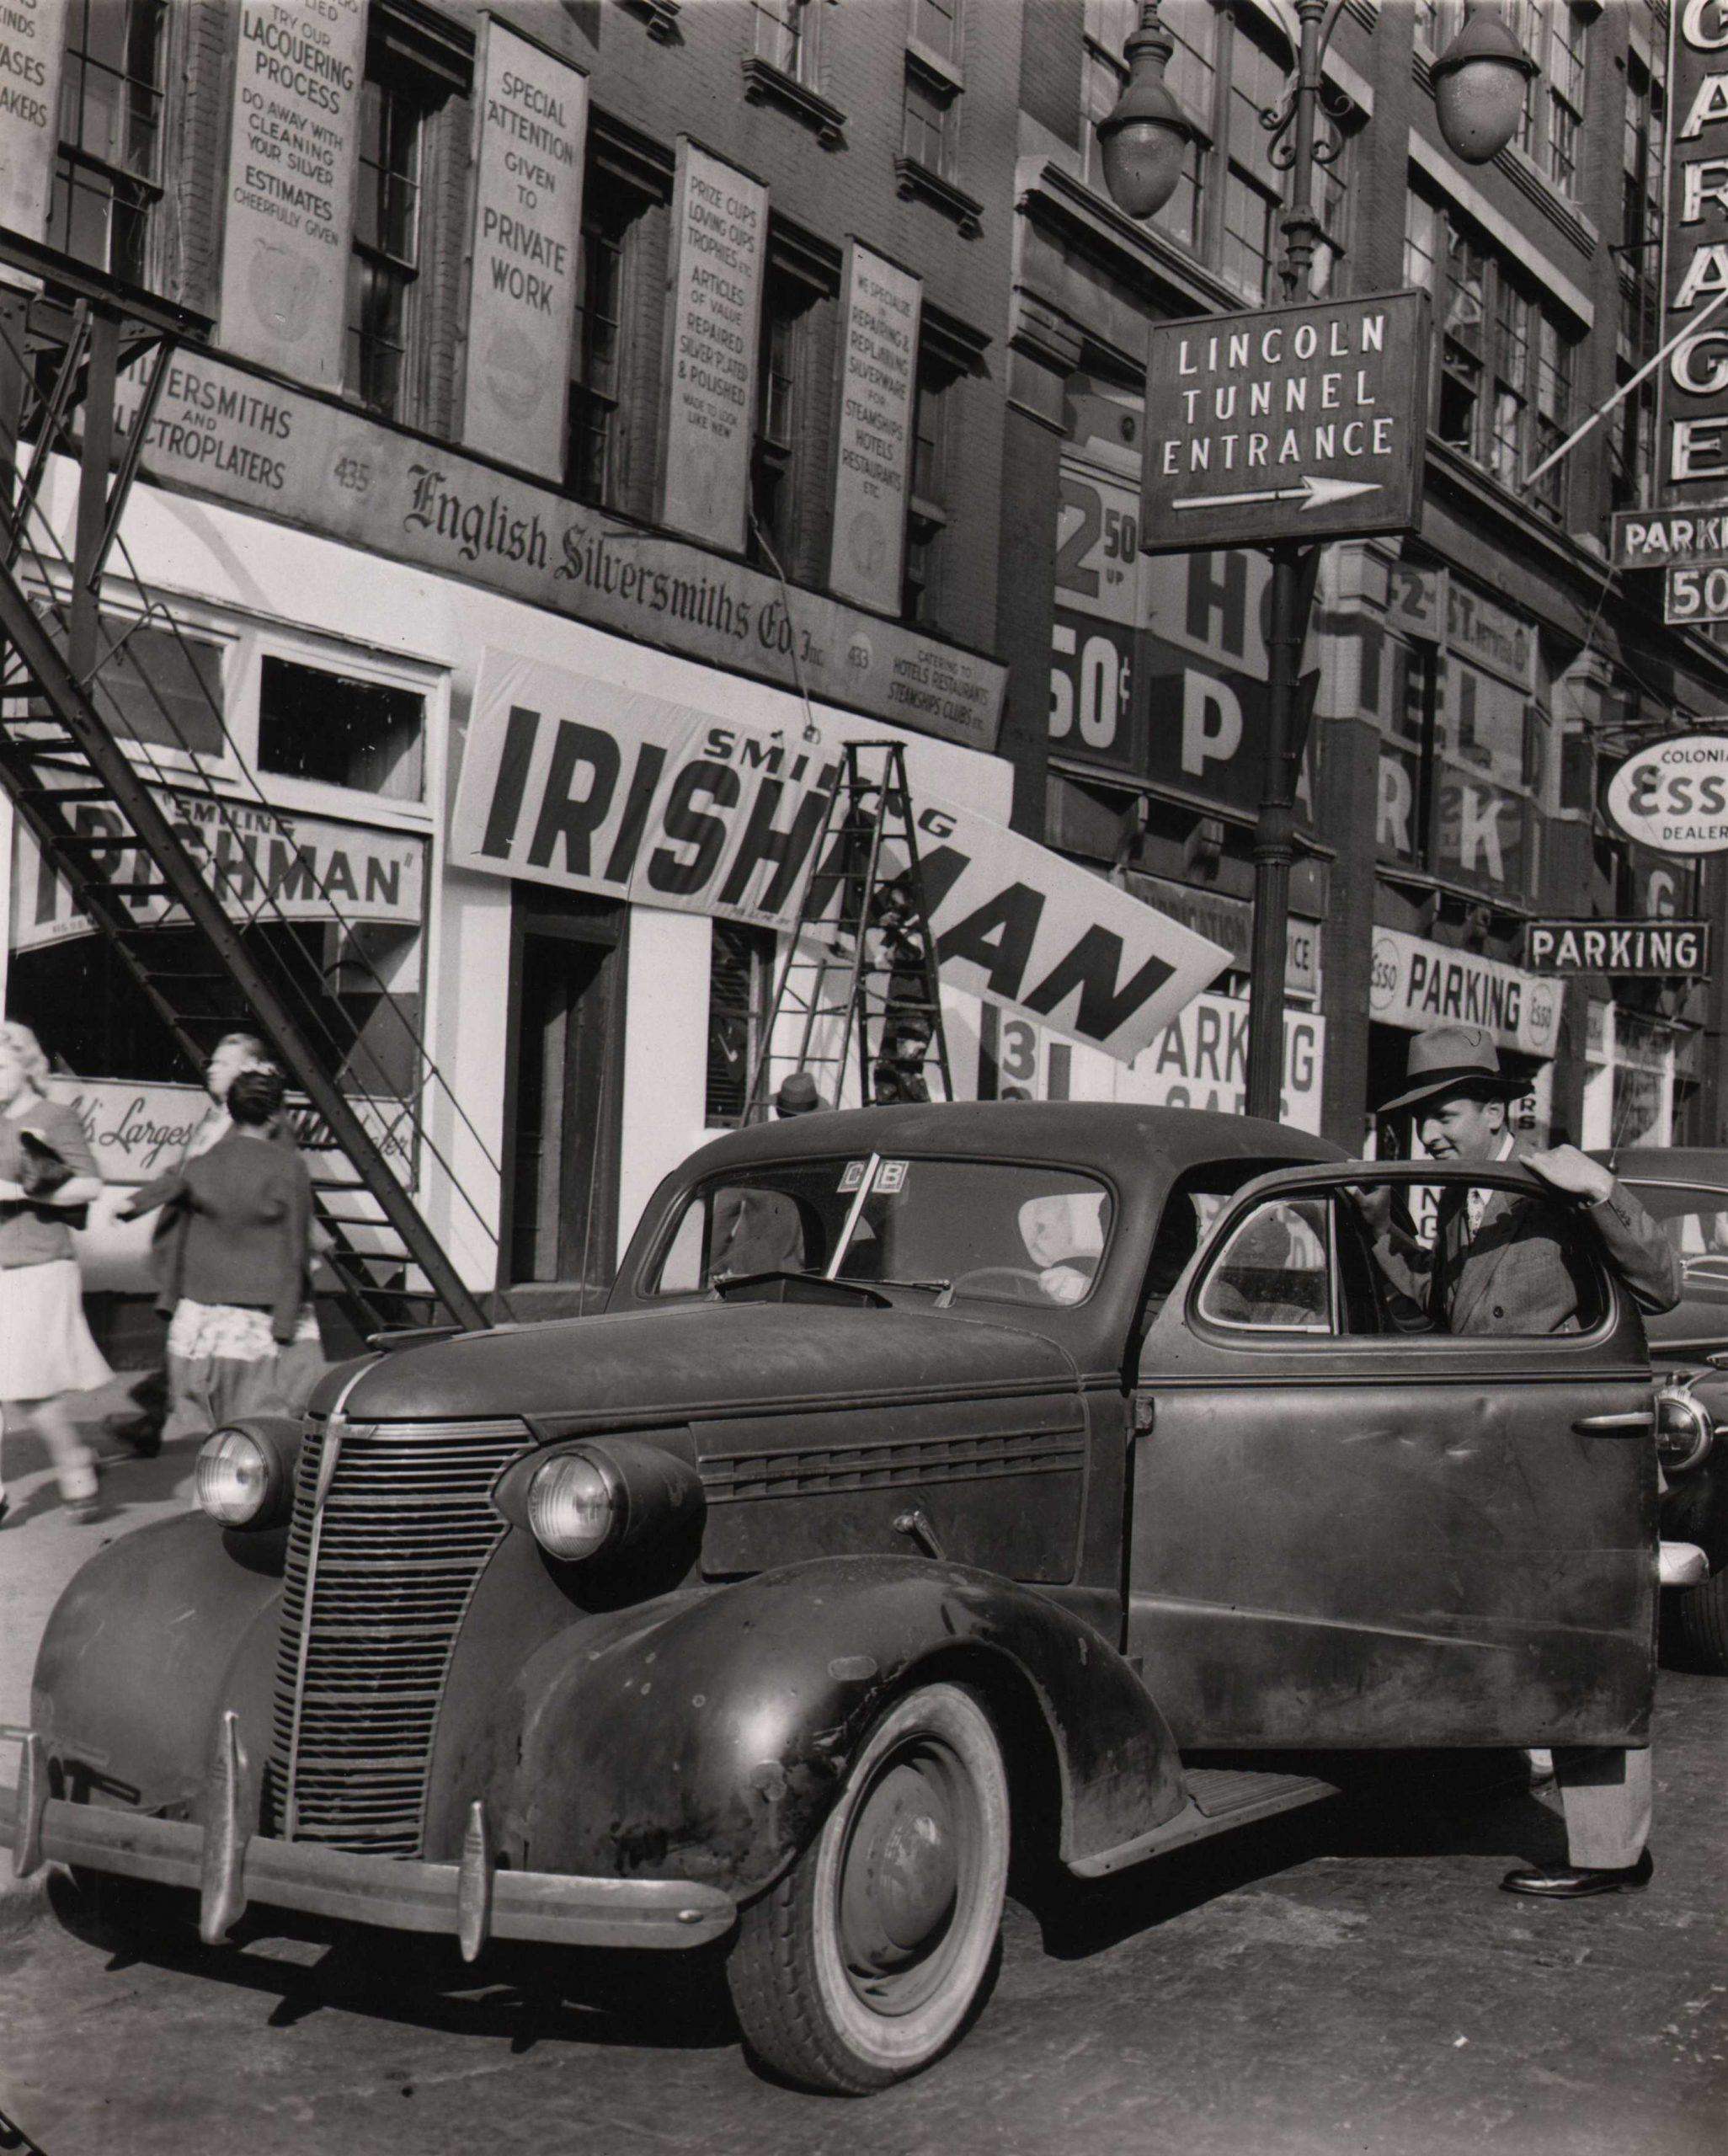 Weegee, Untitled, c. 1945